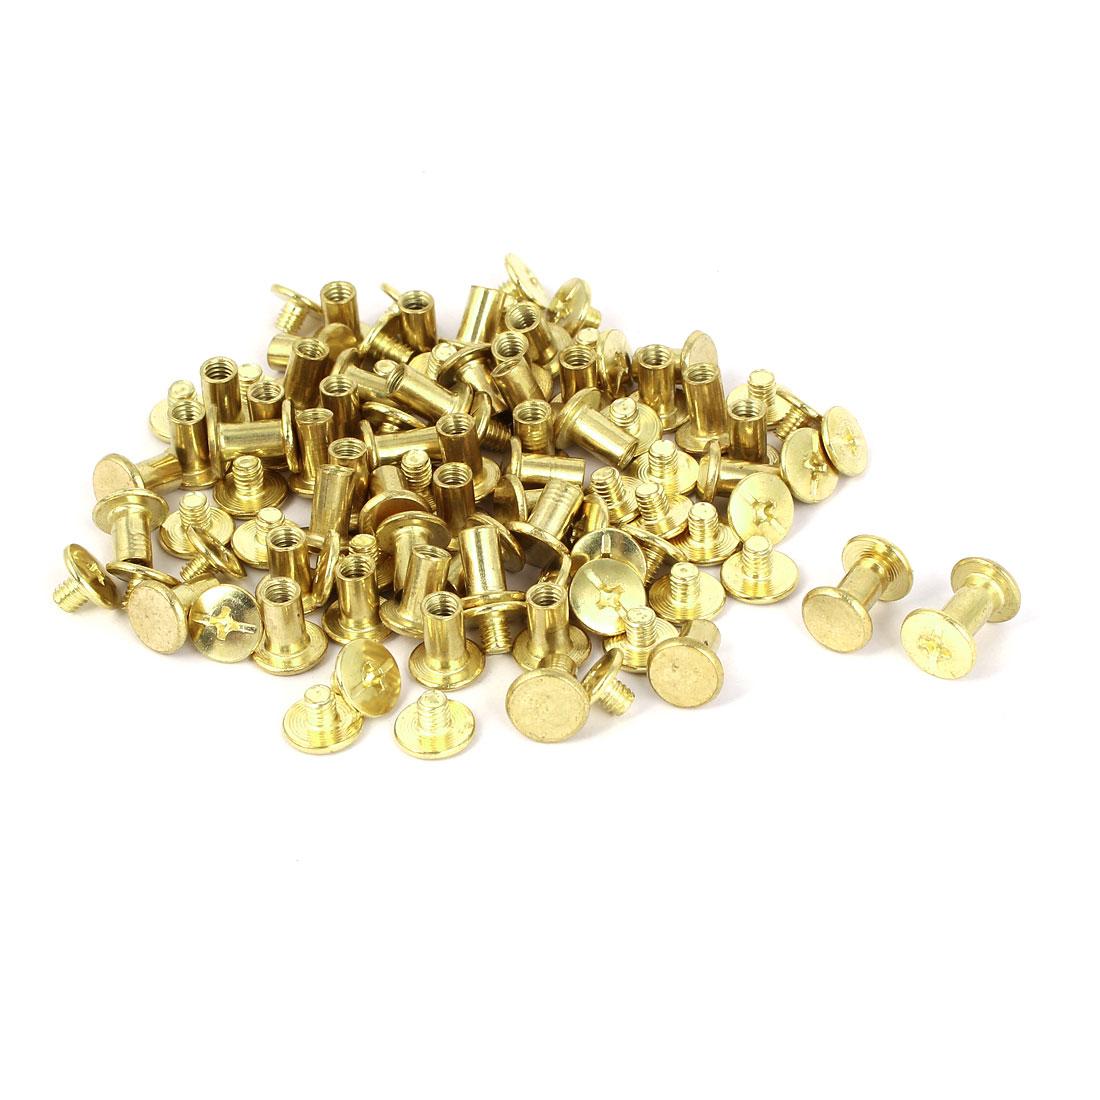 Brass Plated Chicago Screws Binding Posts Docking Rivet 5mmx8mm 50pcs